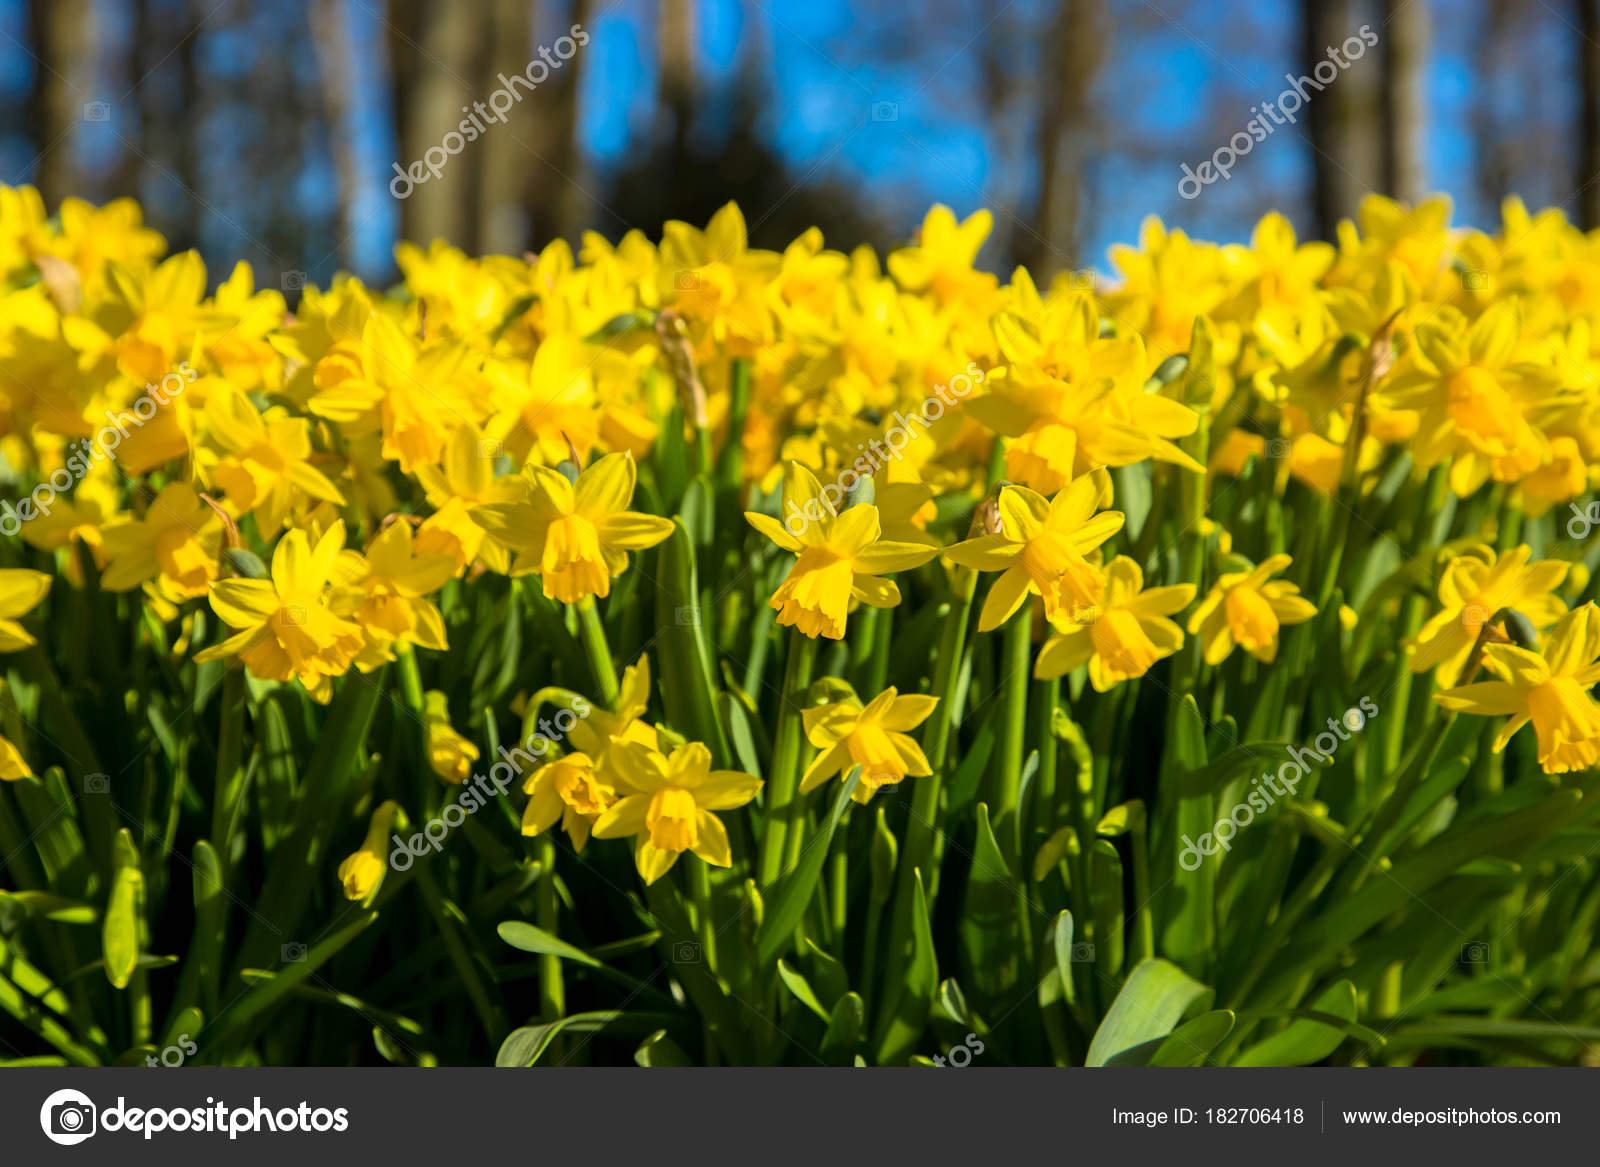 The first spring flowers yellow daffodils spring floral backgro the first spring flowers yellow daffodils yellow spring fragrant flowers daffodils and green grass spring bright floral background photo by vitalinka mightylinksfo